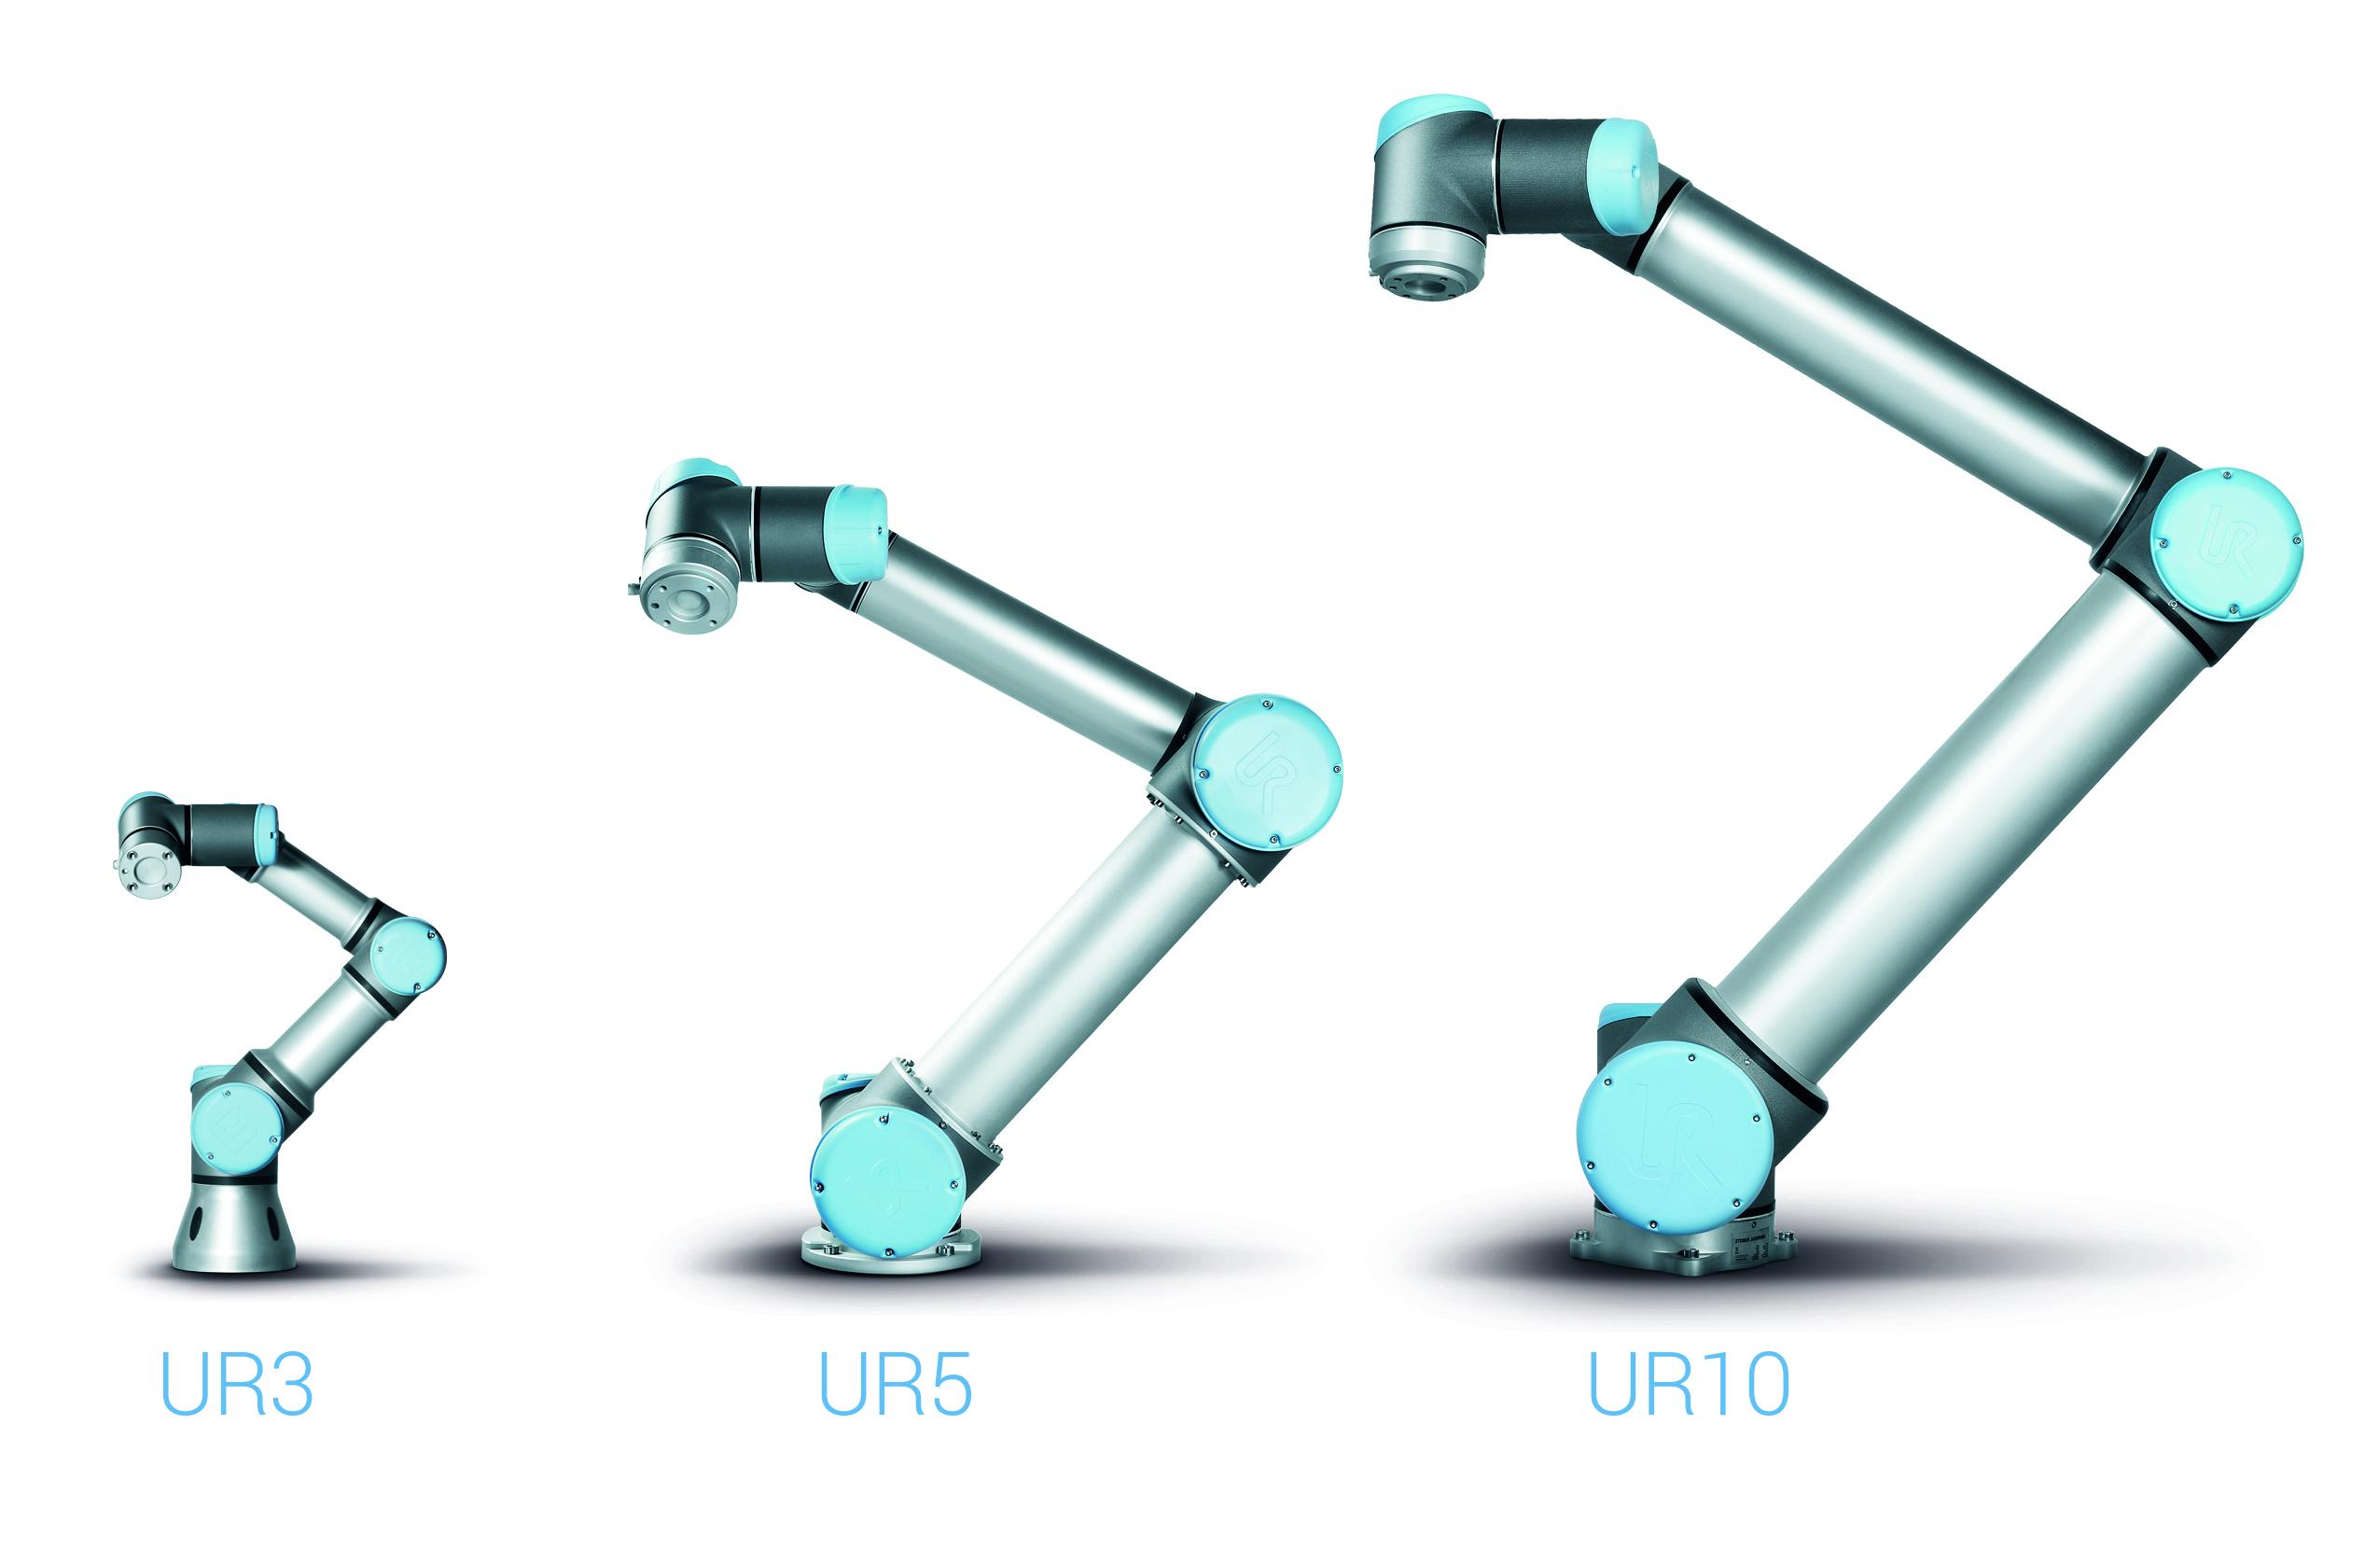 UR3 UR5 & UR10 - Universal Robots